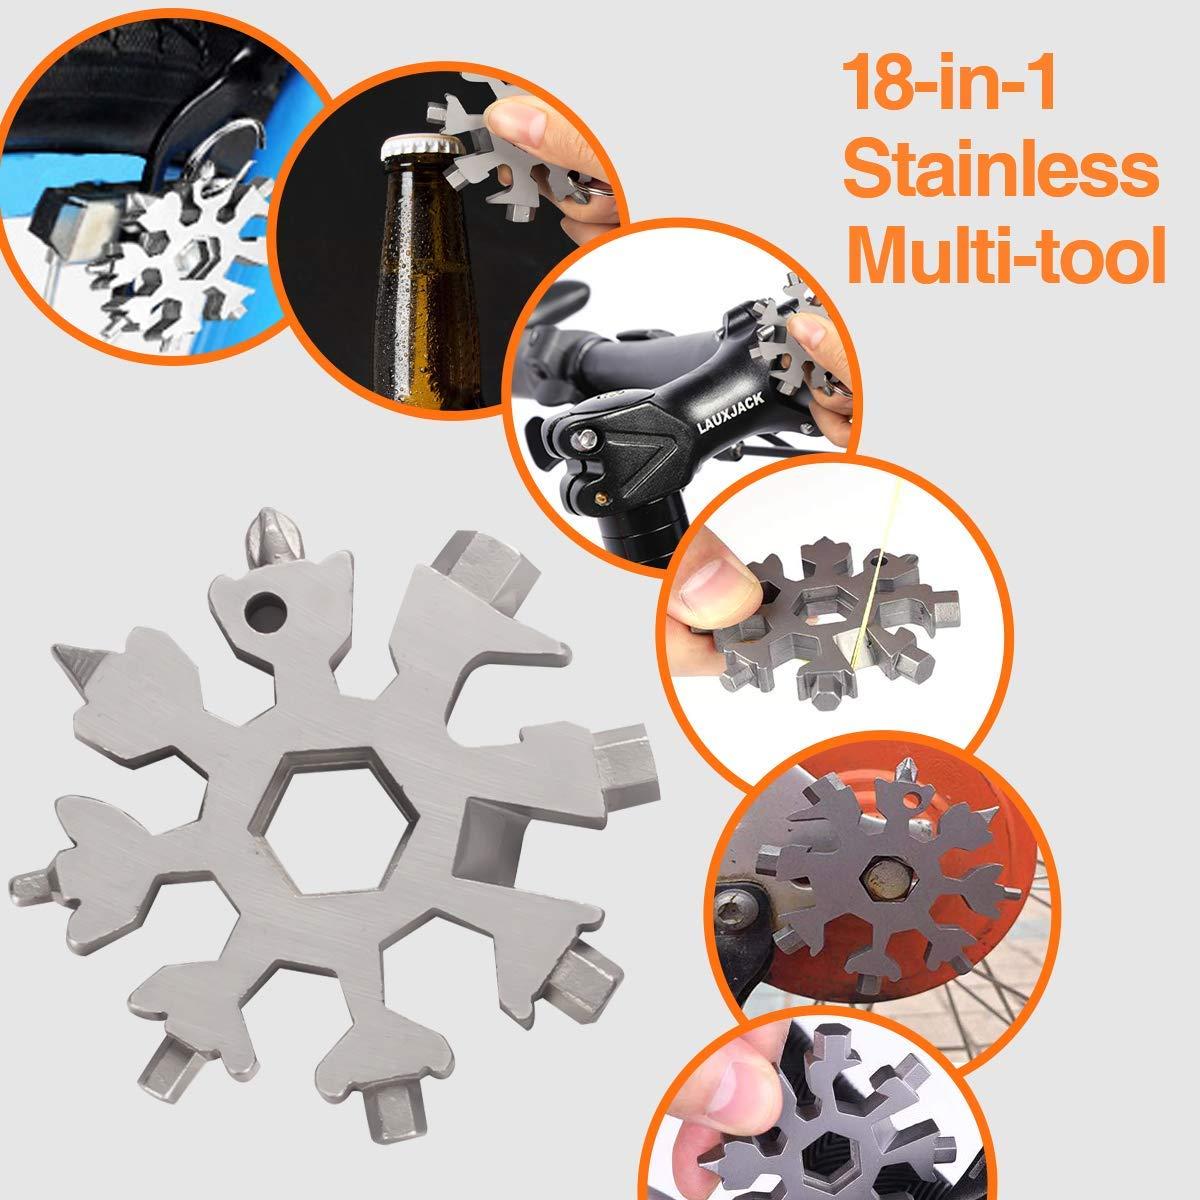 Aitsite Multi herramienta copo de nieve Tarjeta de la herramienta del copo de nieve Destornillador multi-herramienta de acero Llavero Abrebotellas Tarjeta Negro